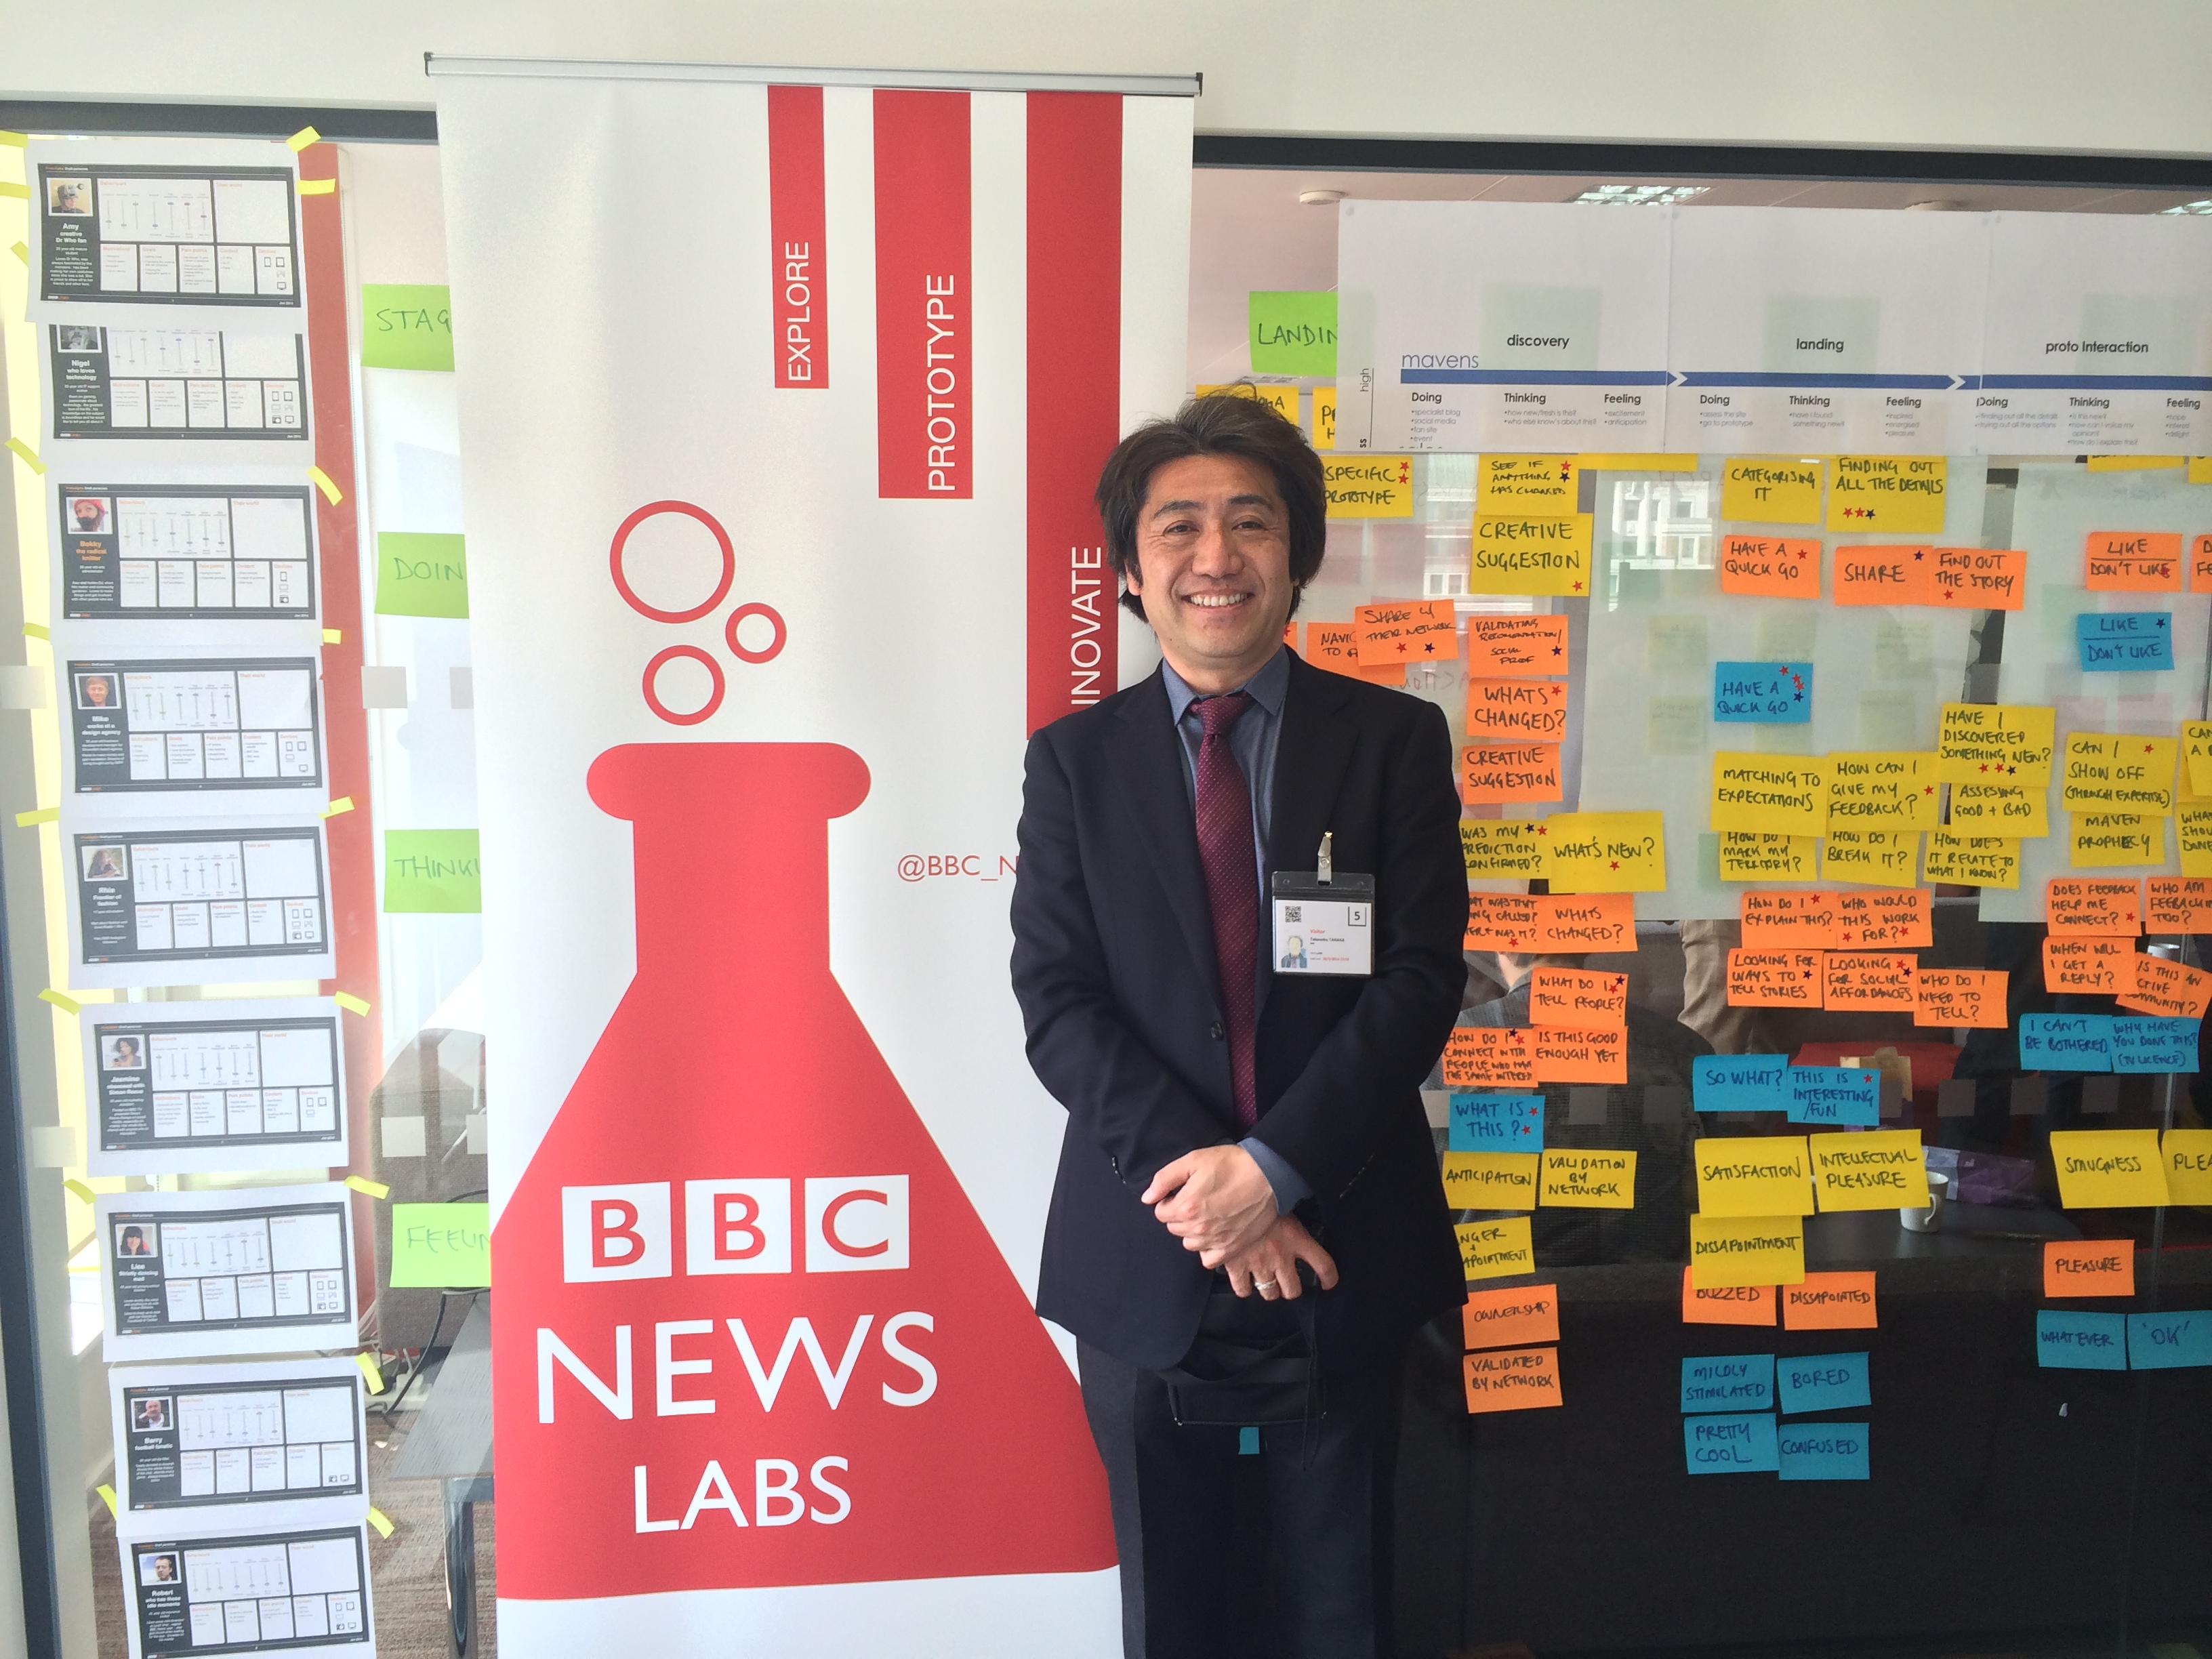 Takanobu from NHK at BBC NEWS LABS